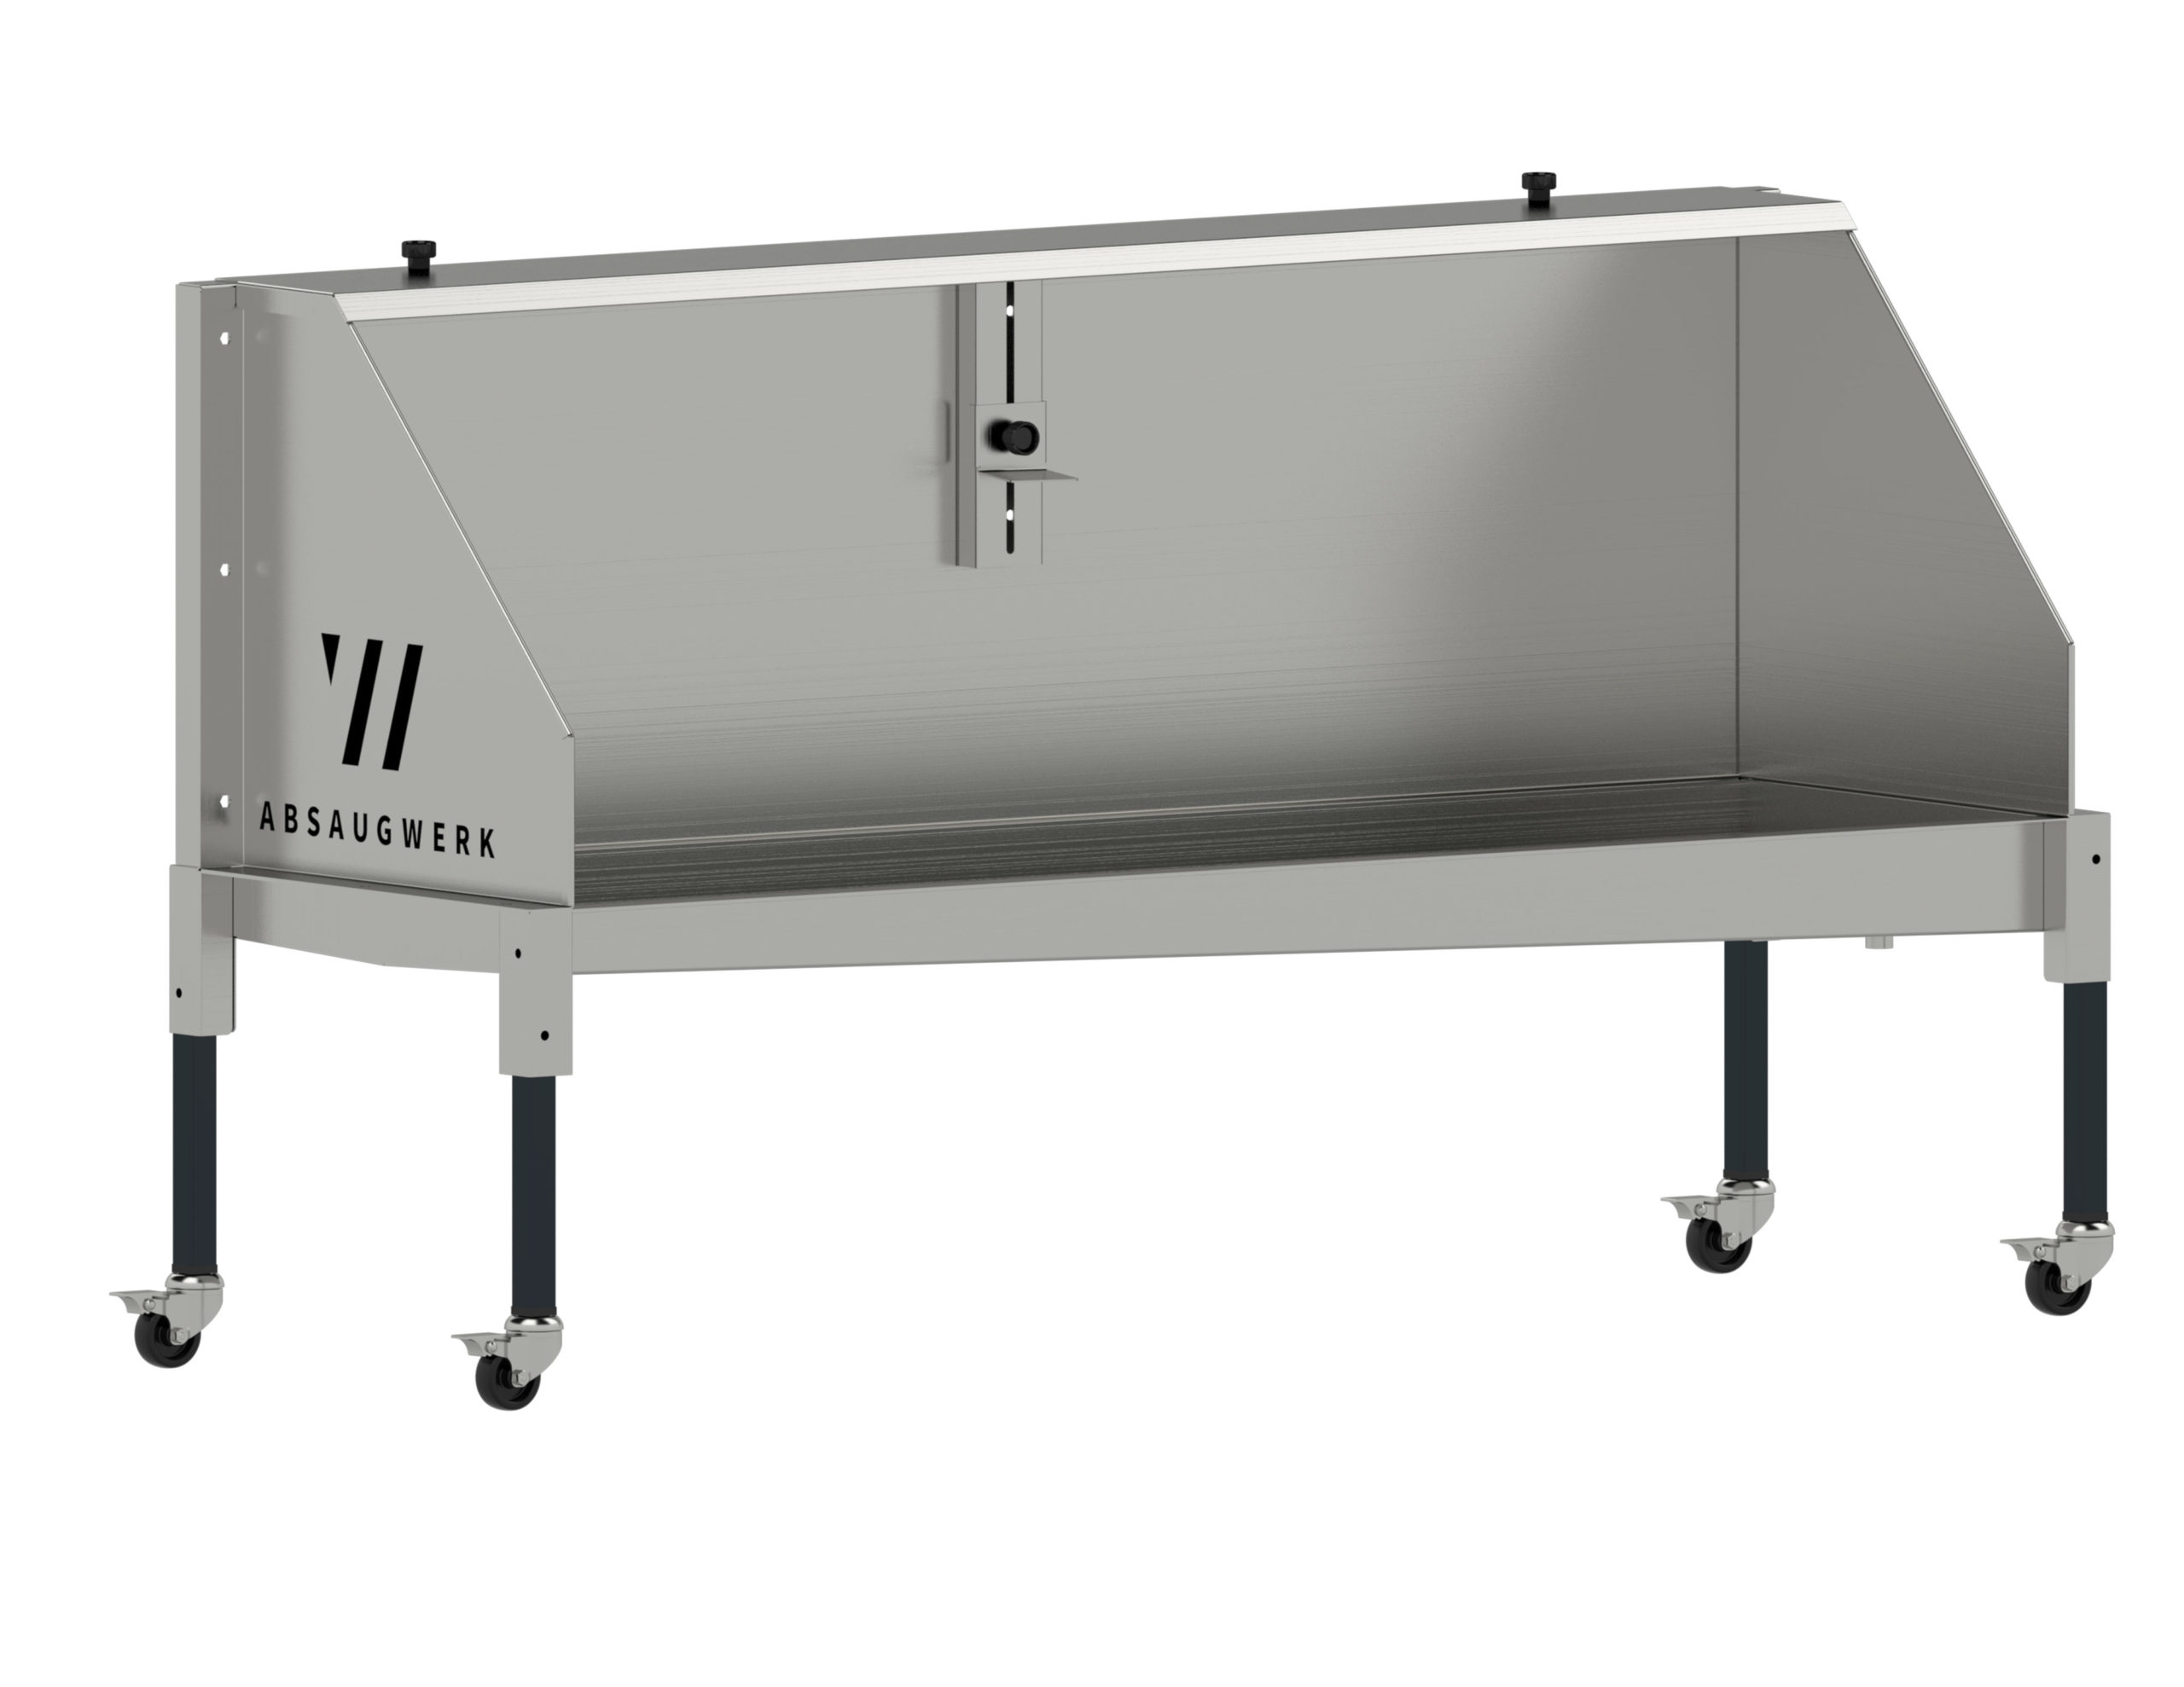 Cleanbox_ABSAUGWERK_GmbH